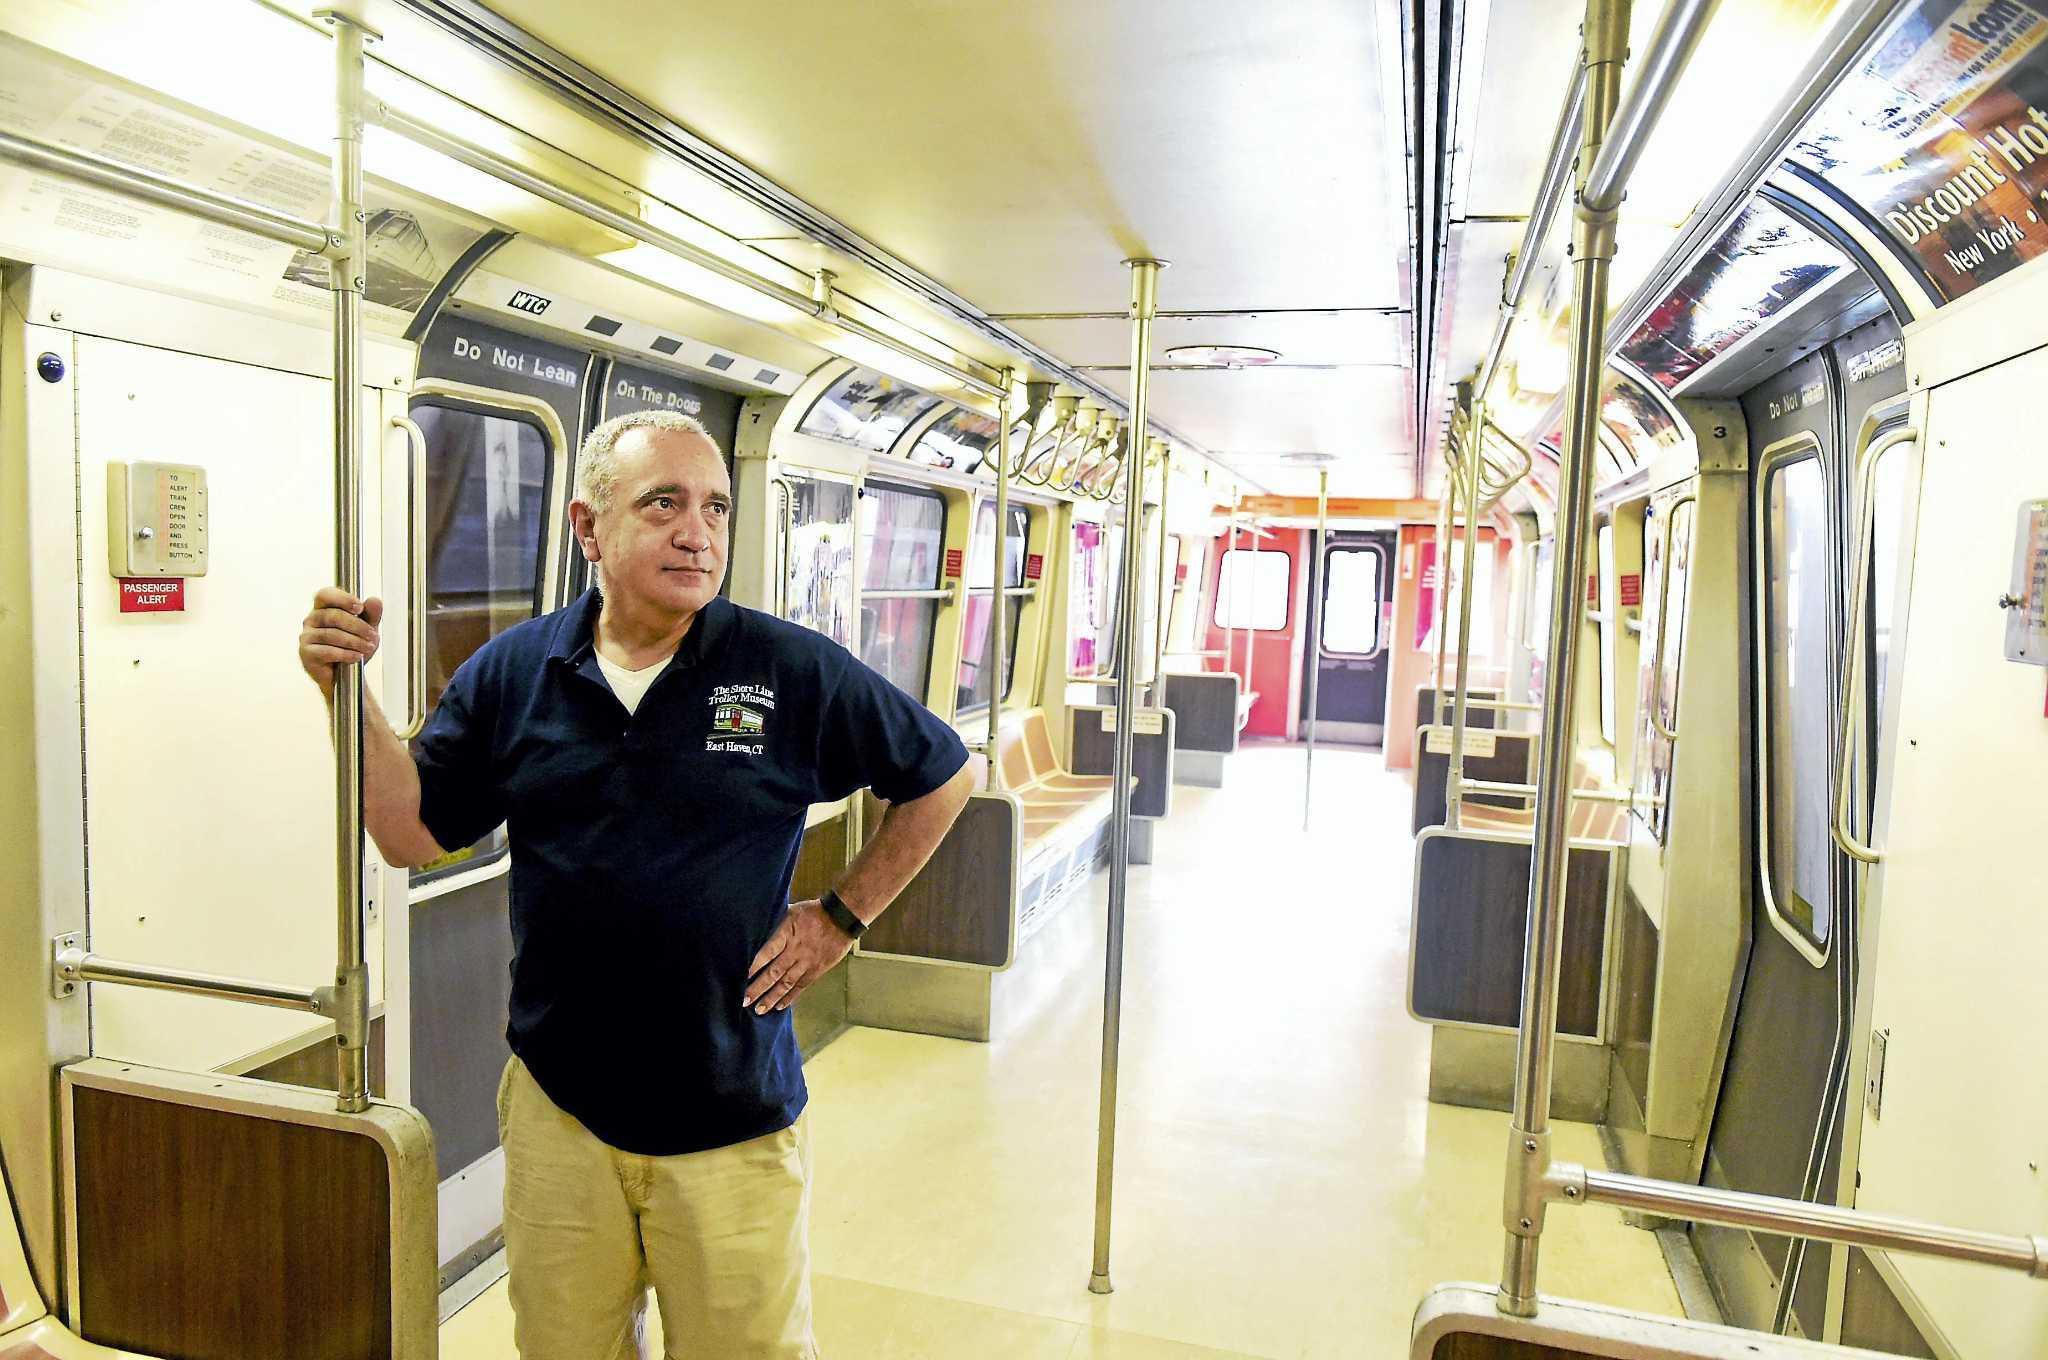 Refurbished train commemorates 15th anniversary of 9/11 at